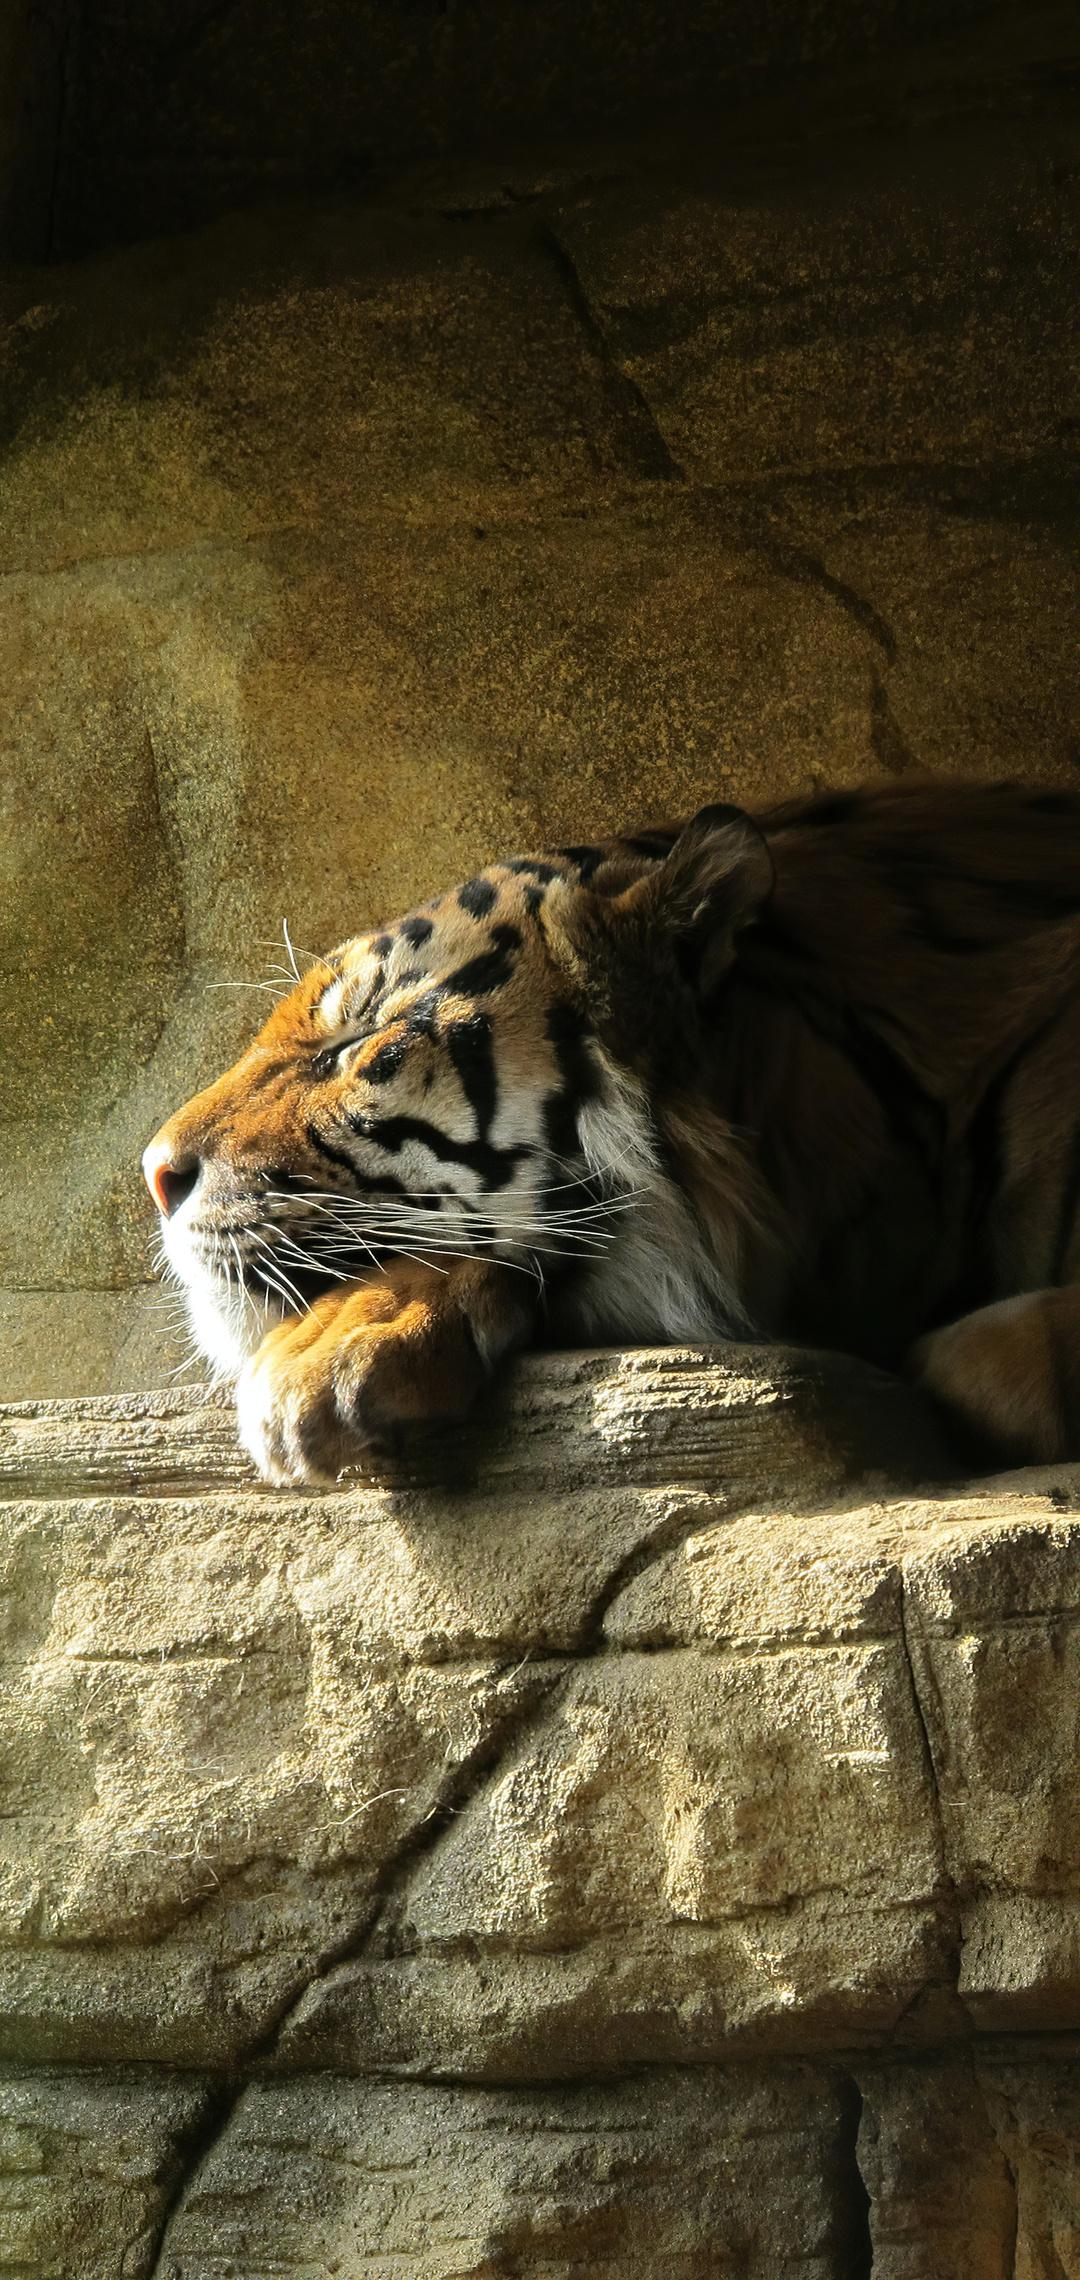 tiger-sleeping-closed-eyes-5k-1r.jpg